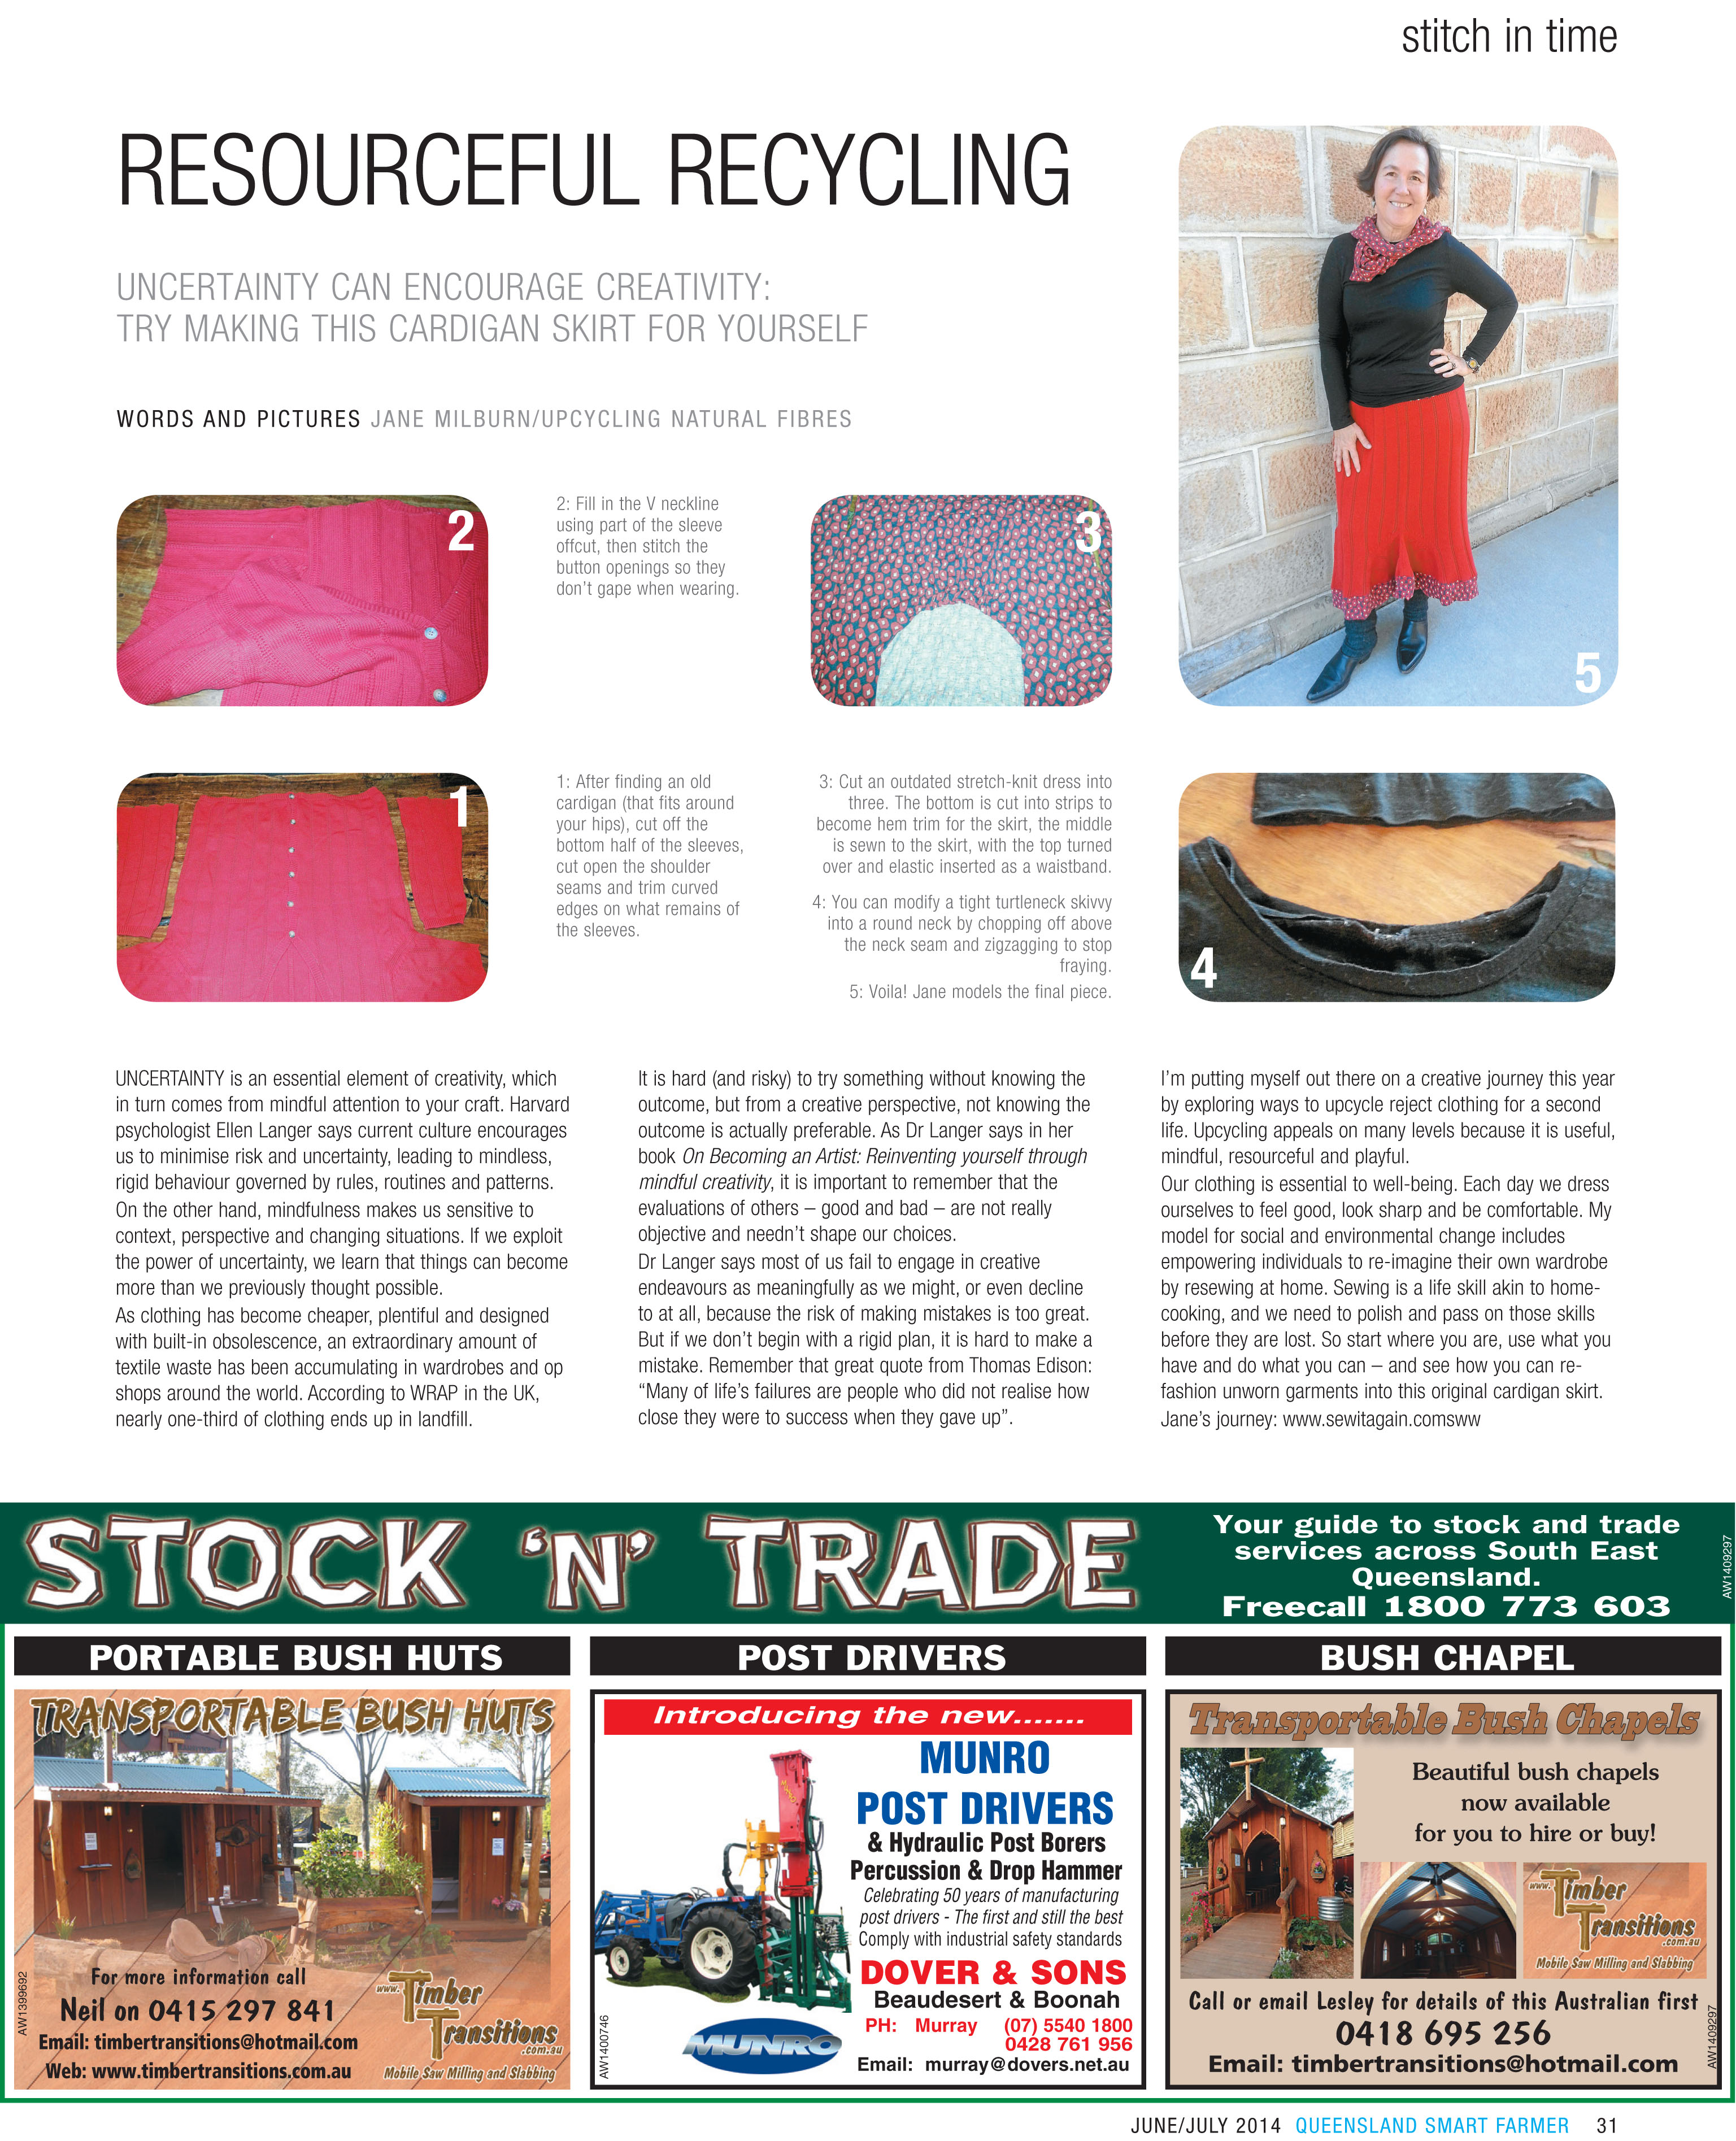 Stitch in Time column by Jane Milburn, Smart Farmer June 2014